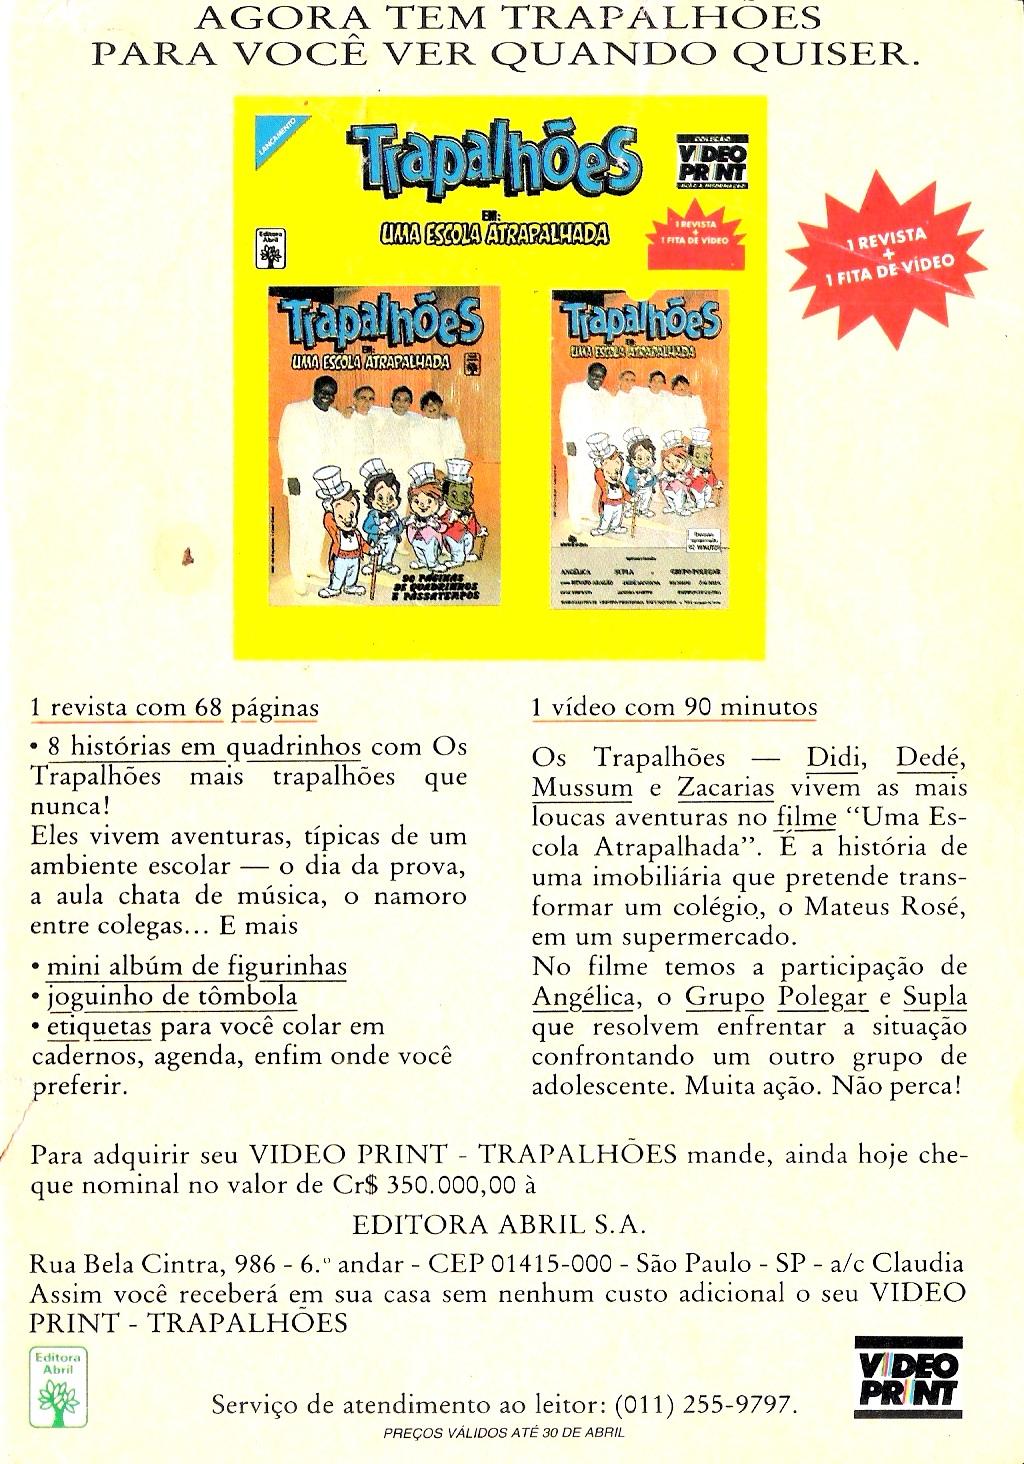 ATP1s10_08_Editora_Abril_Video_Print_Tra